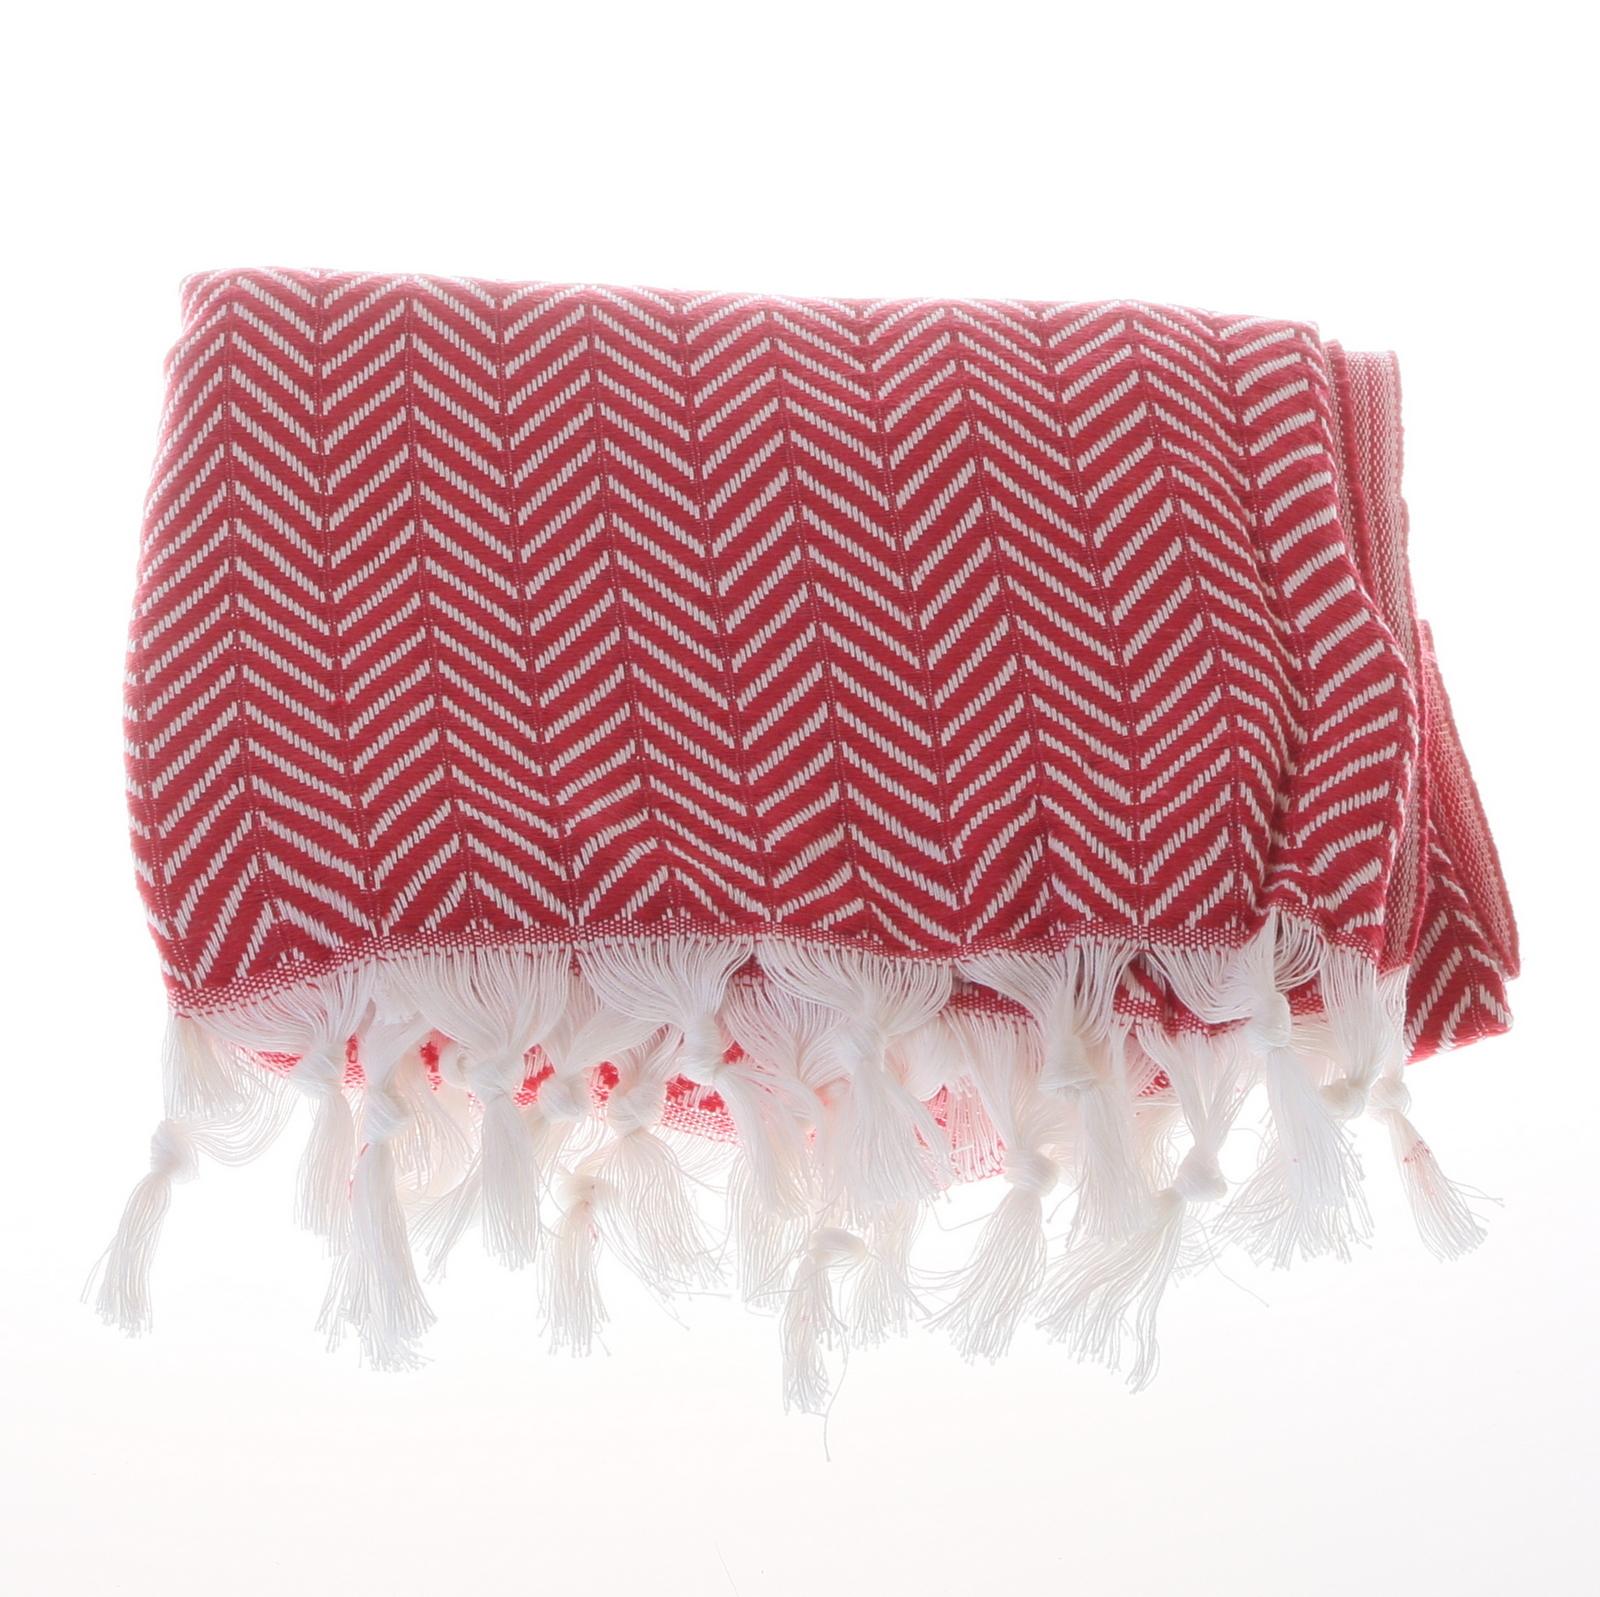 Big zigzag pattern cotton hammam towel - Red